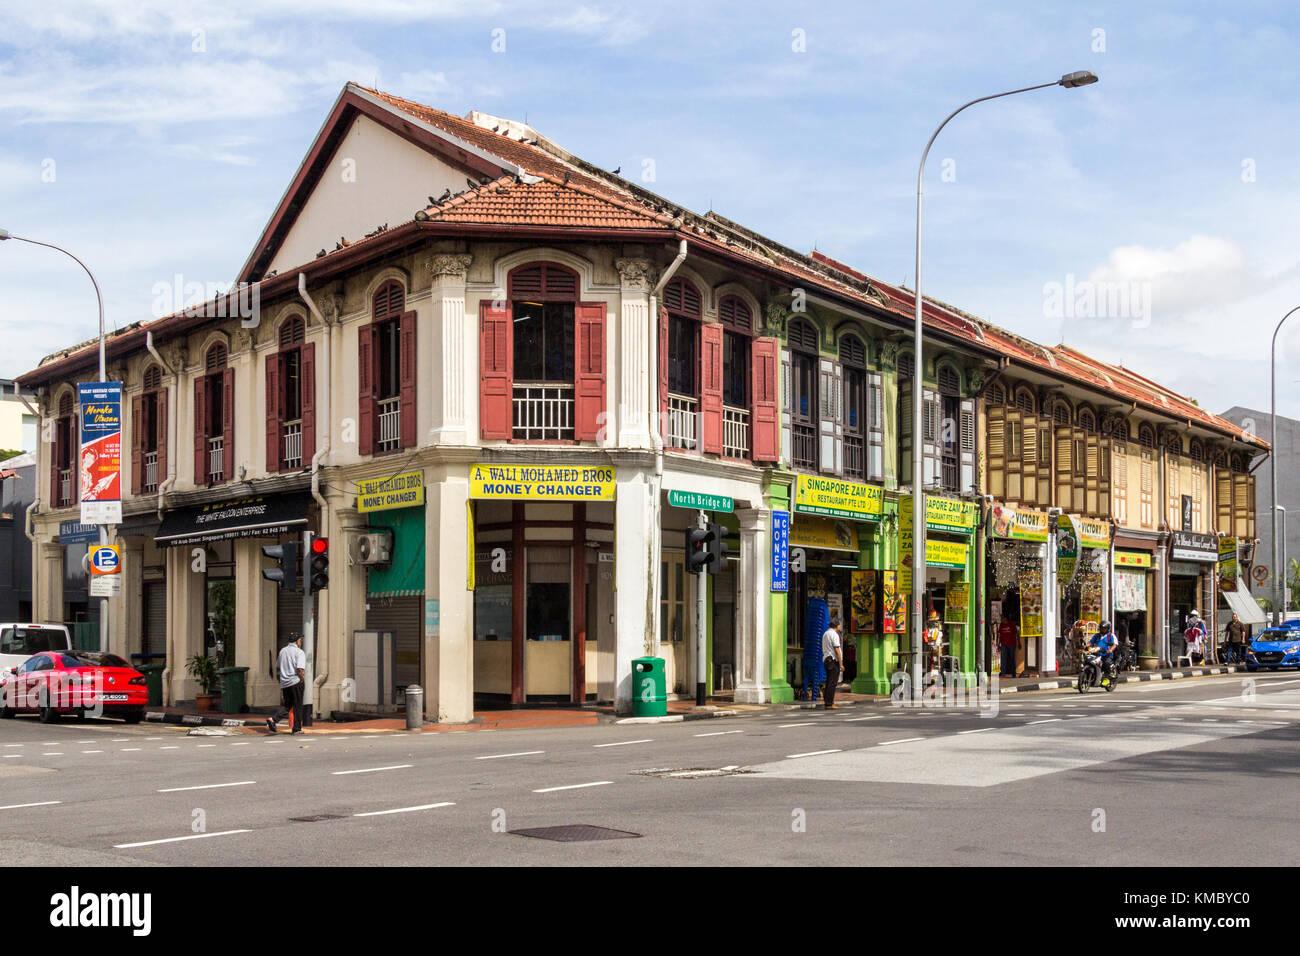 Typical shophouses, North Bridge Road, Singapore - Stock Image